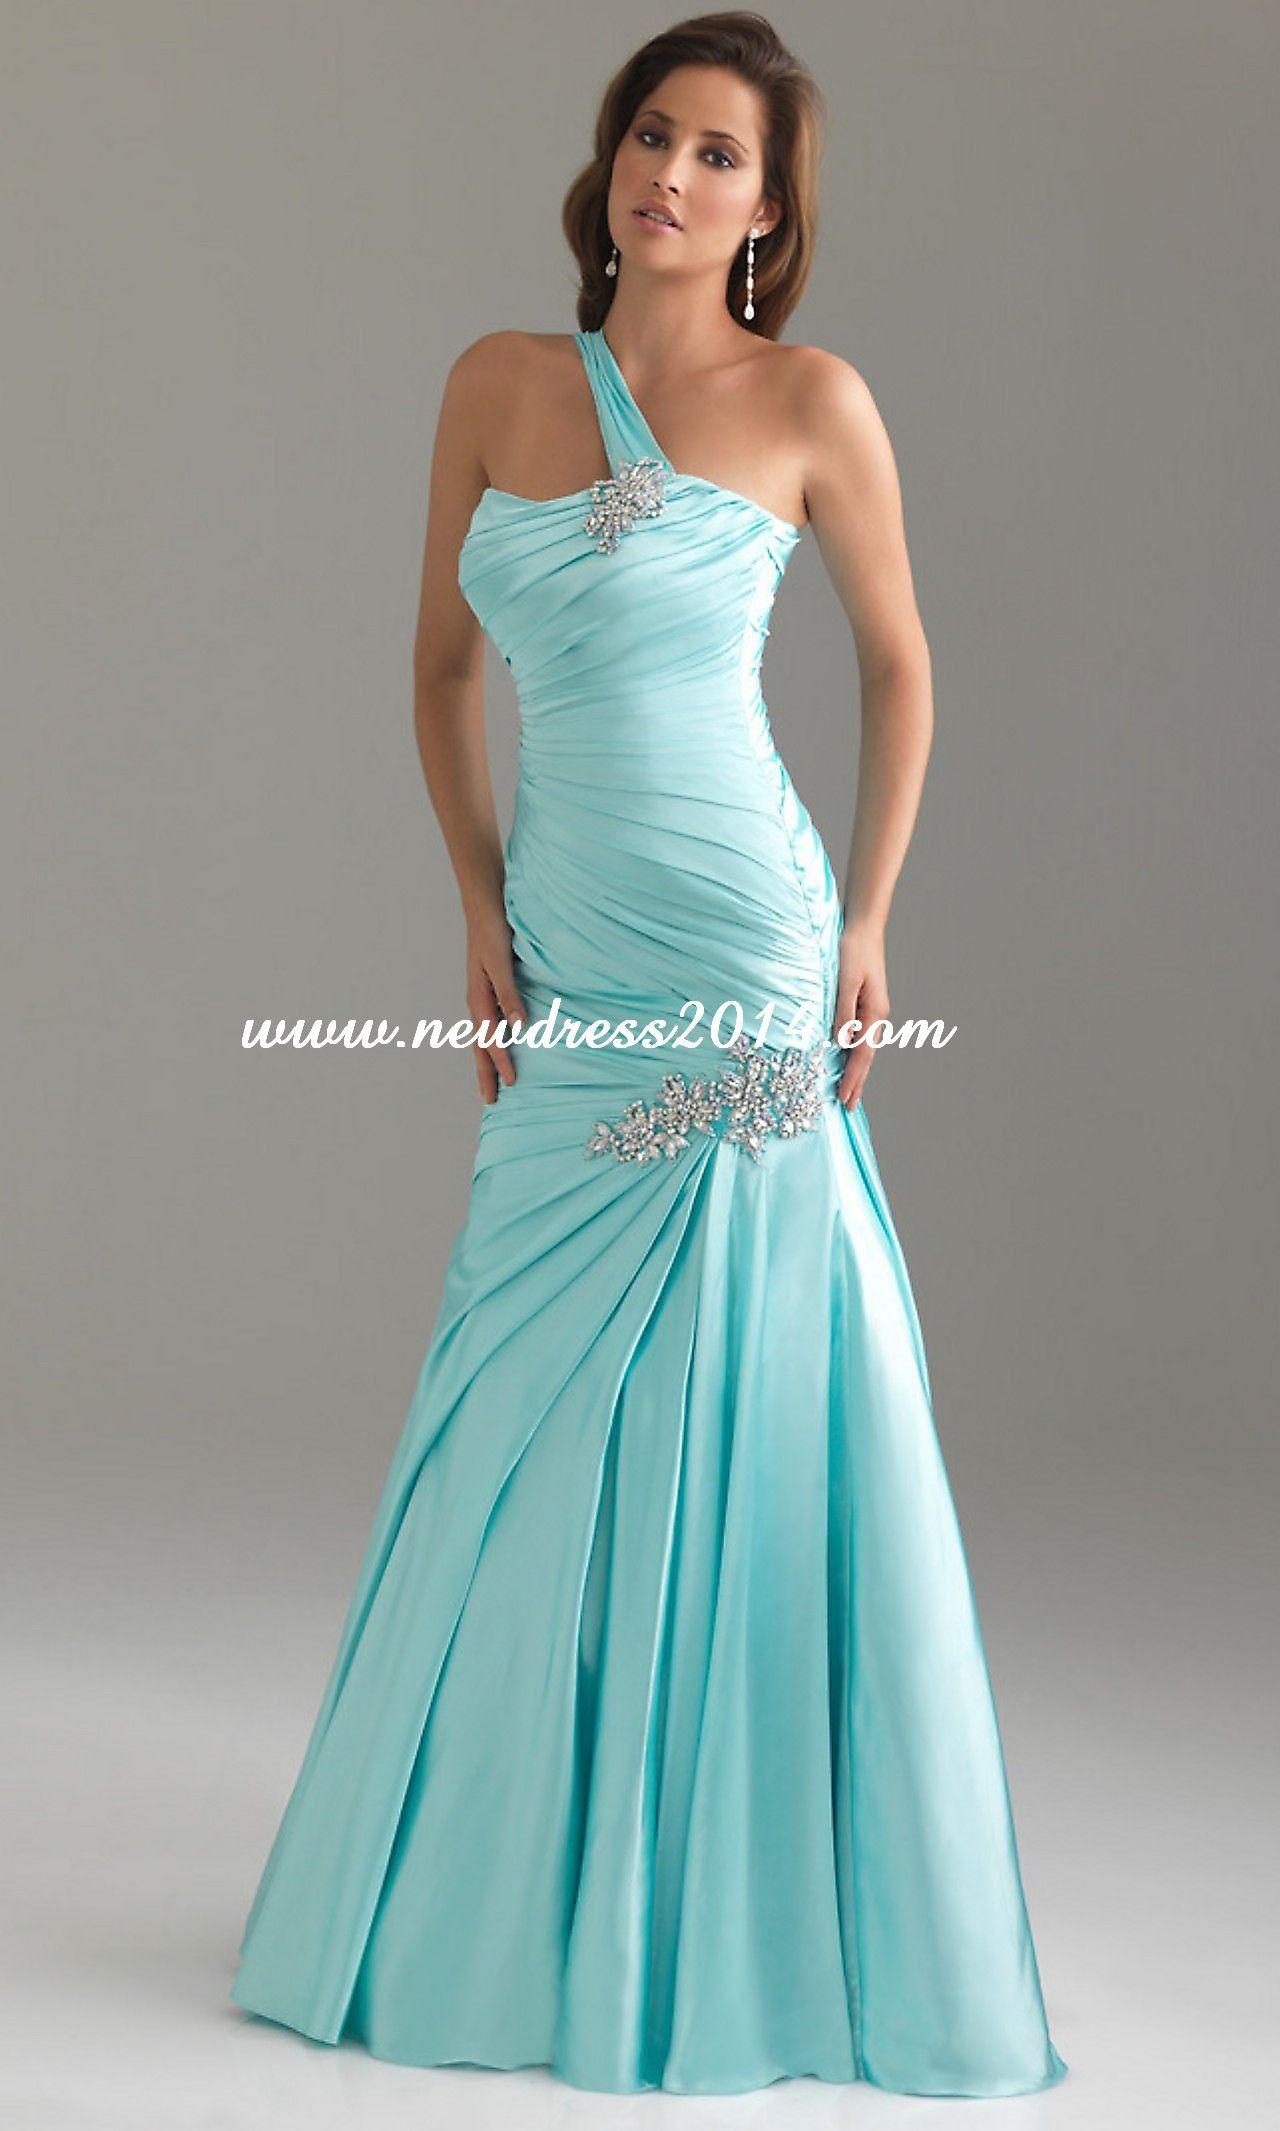 pretty Brides Maids Dress | Clothing, etc | Pinterest | Maids, Prom ...